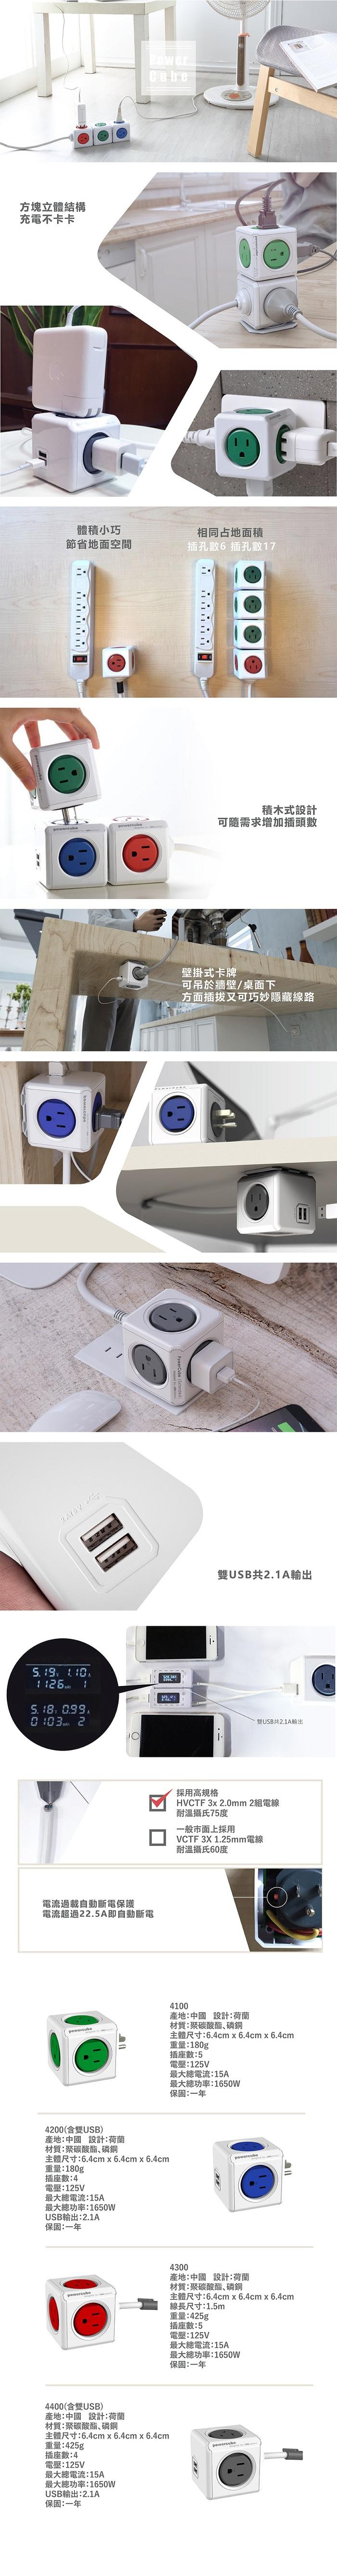 Allocacoc | NoteBook Modular A4 百搭筆記本 + PowerCube 雙USB延長線 - 灰色(線長1.5公尺)